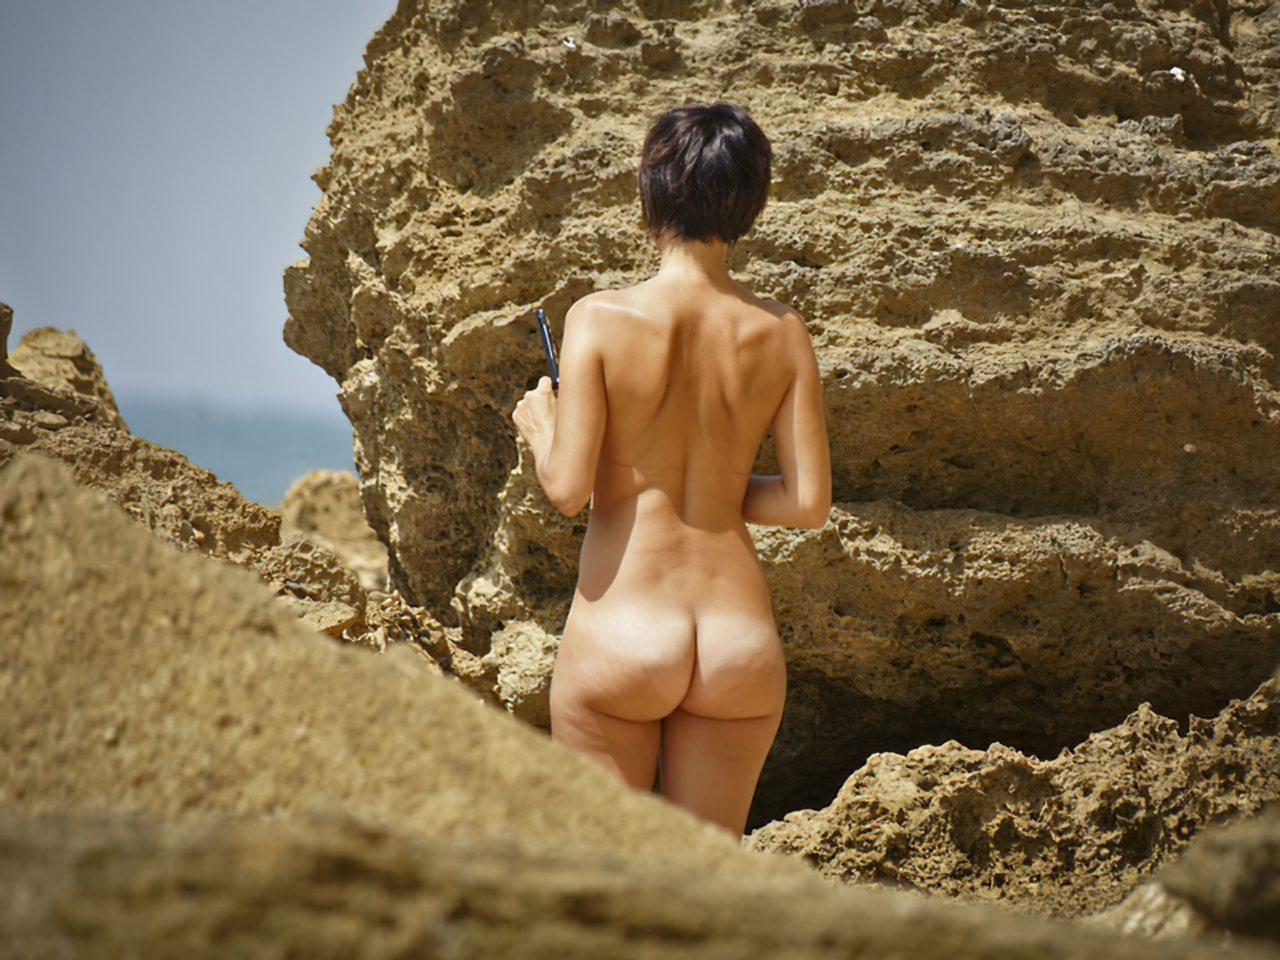 Mulher Pelada Praia Nudista (4)